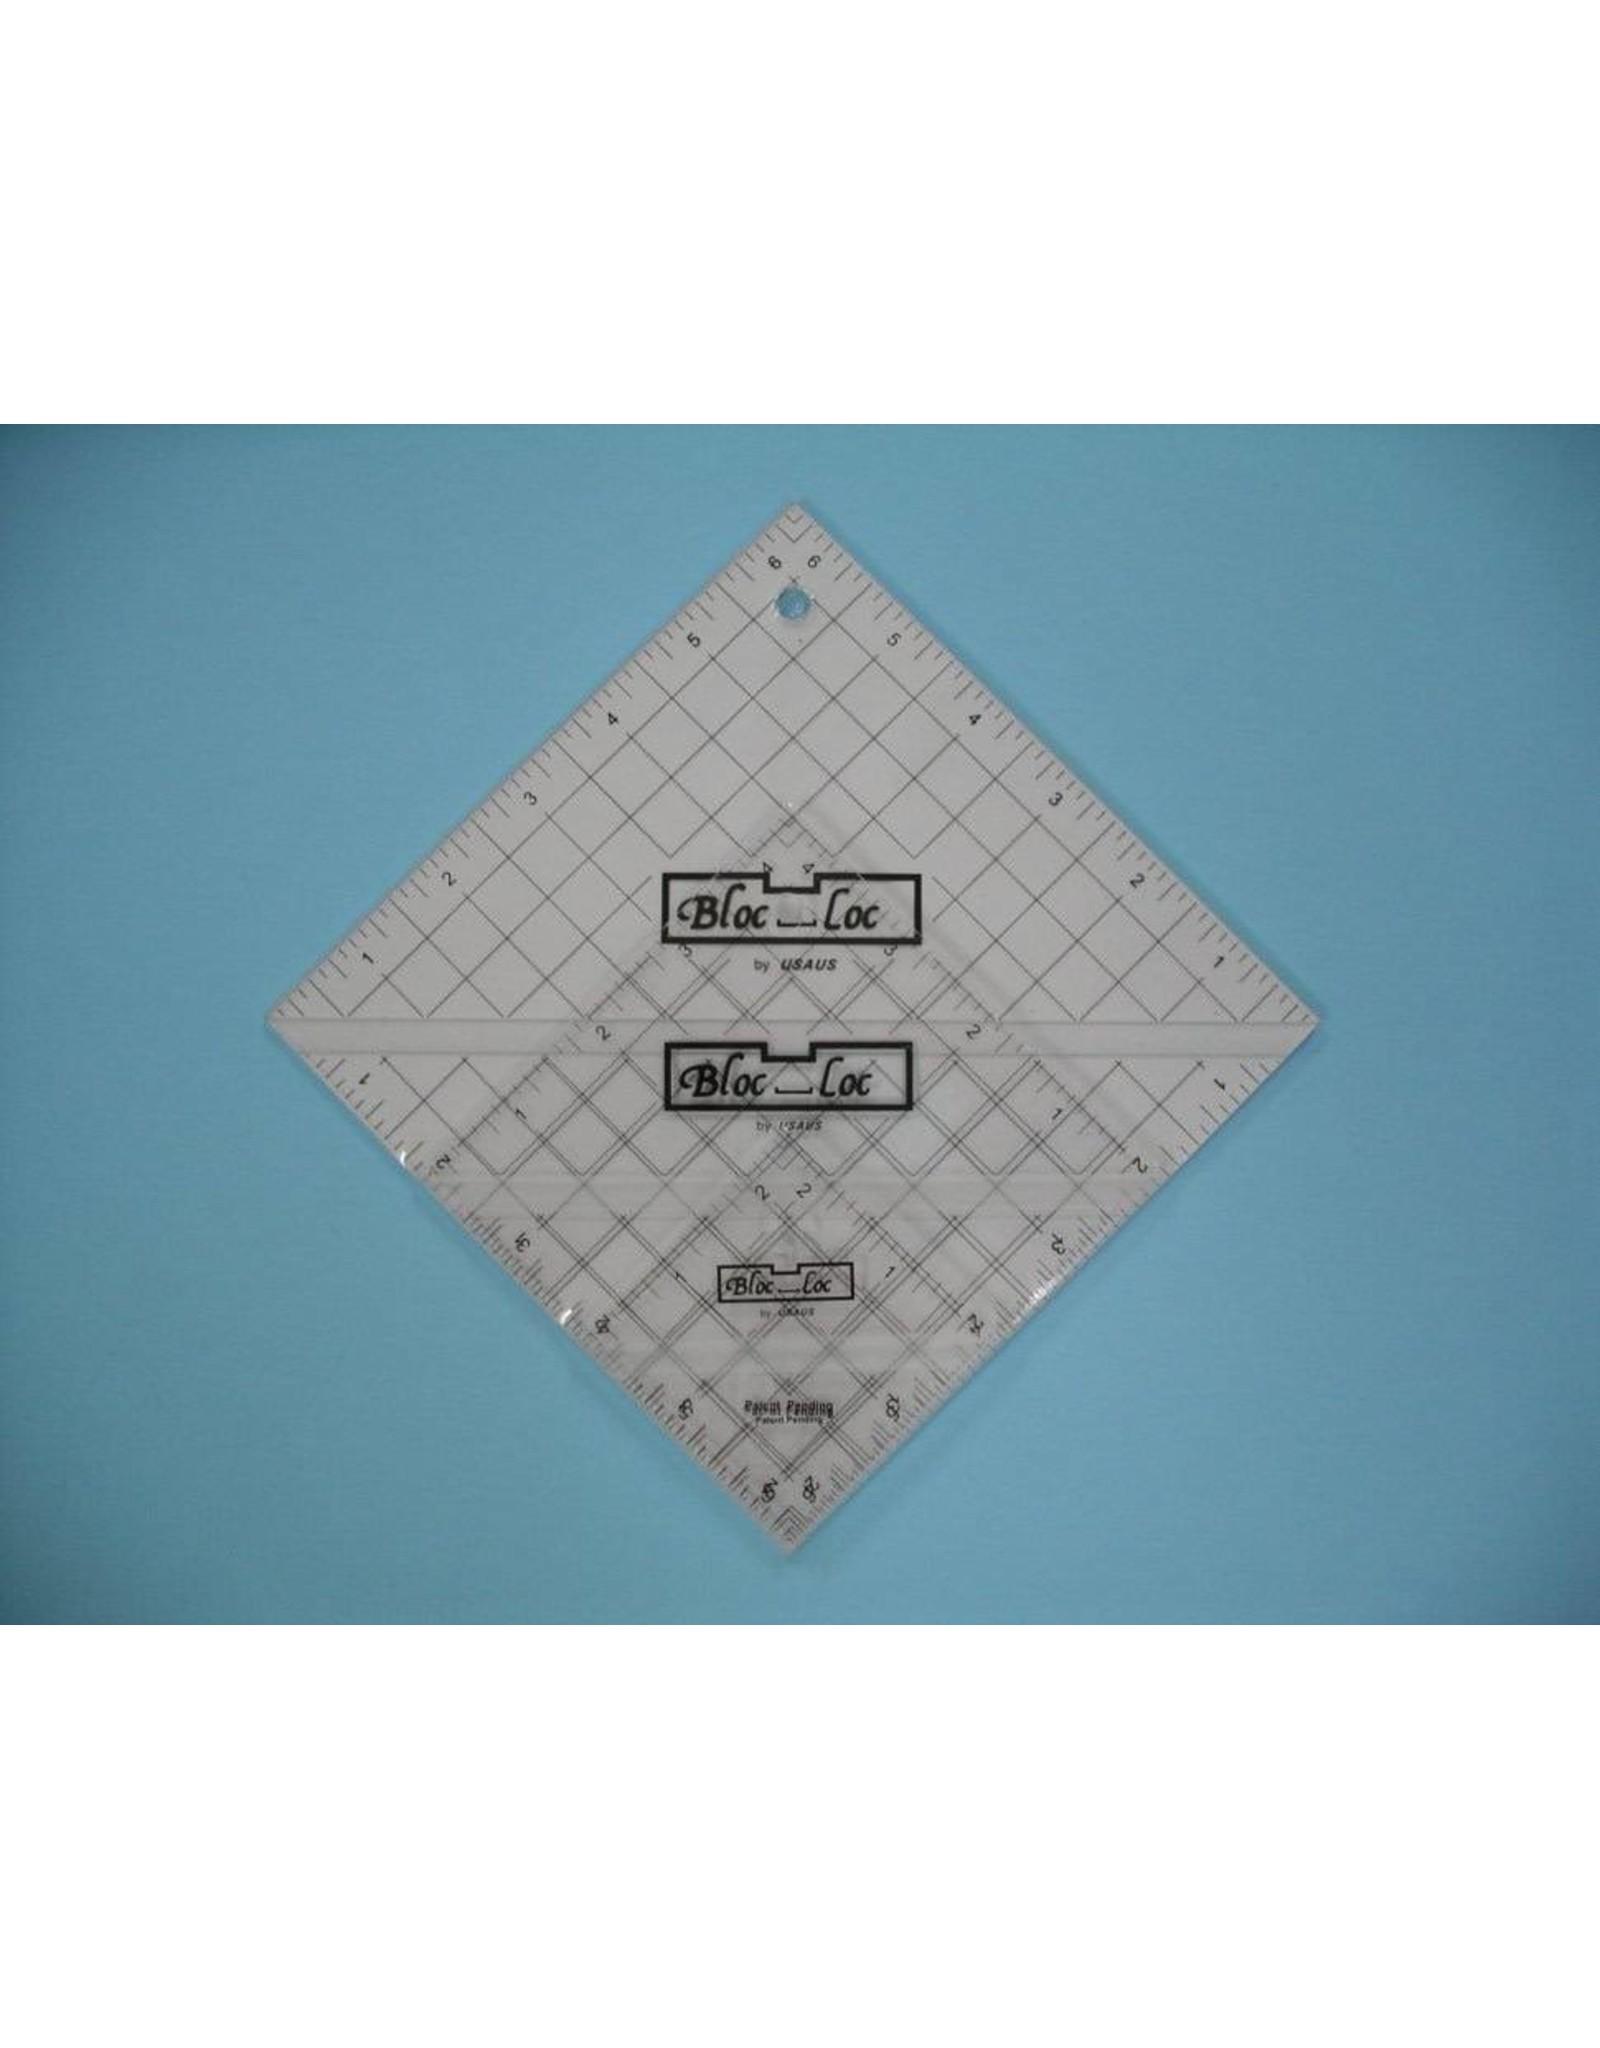 Bloc Loc Half Square Triangle Ruler Set - 2,5 - 4,5 - 6,5 inch